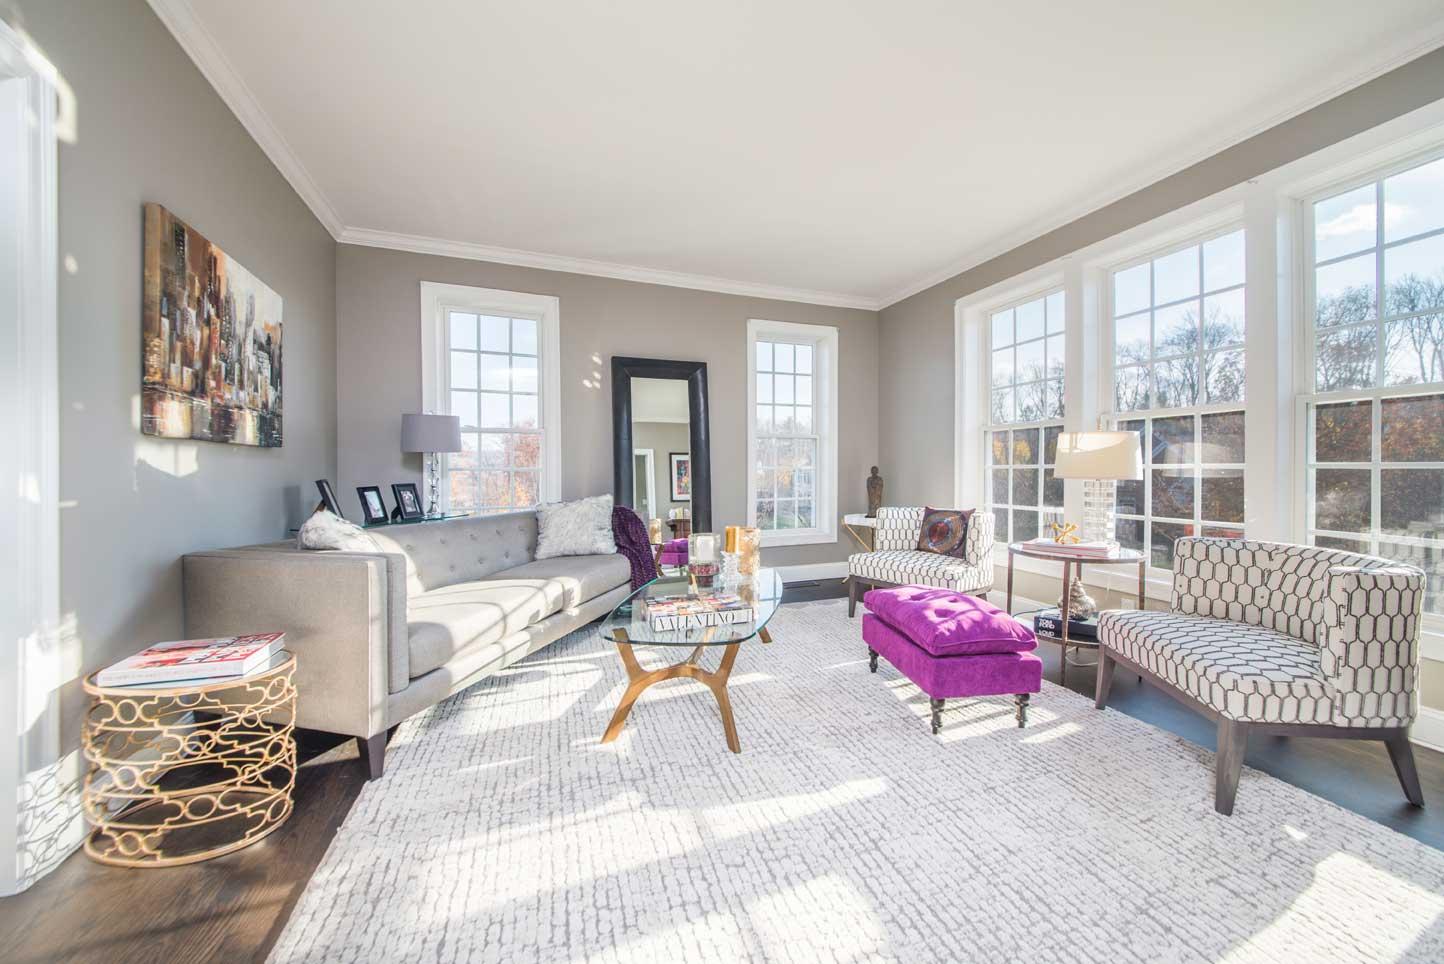 sandi lanigan interiors interior design home staging gallery. Black Bedroom Furniture Sets. Home Design Ideas